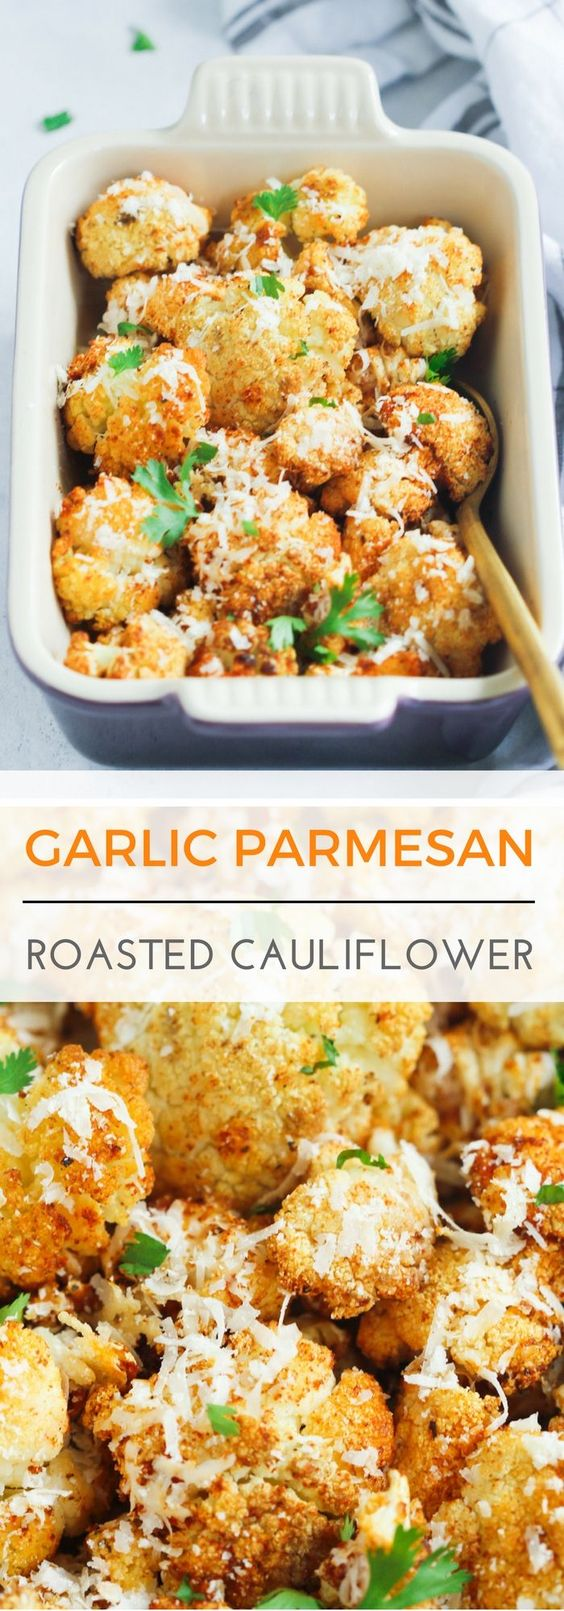 Garlic Parmesan Roasted Cauliflower.